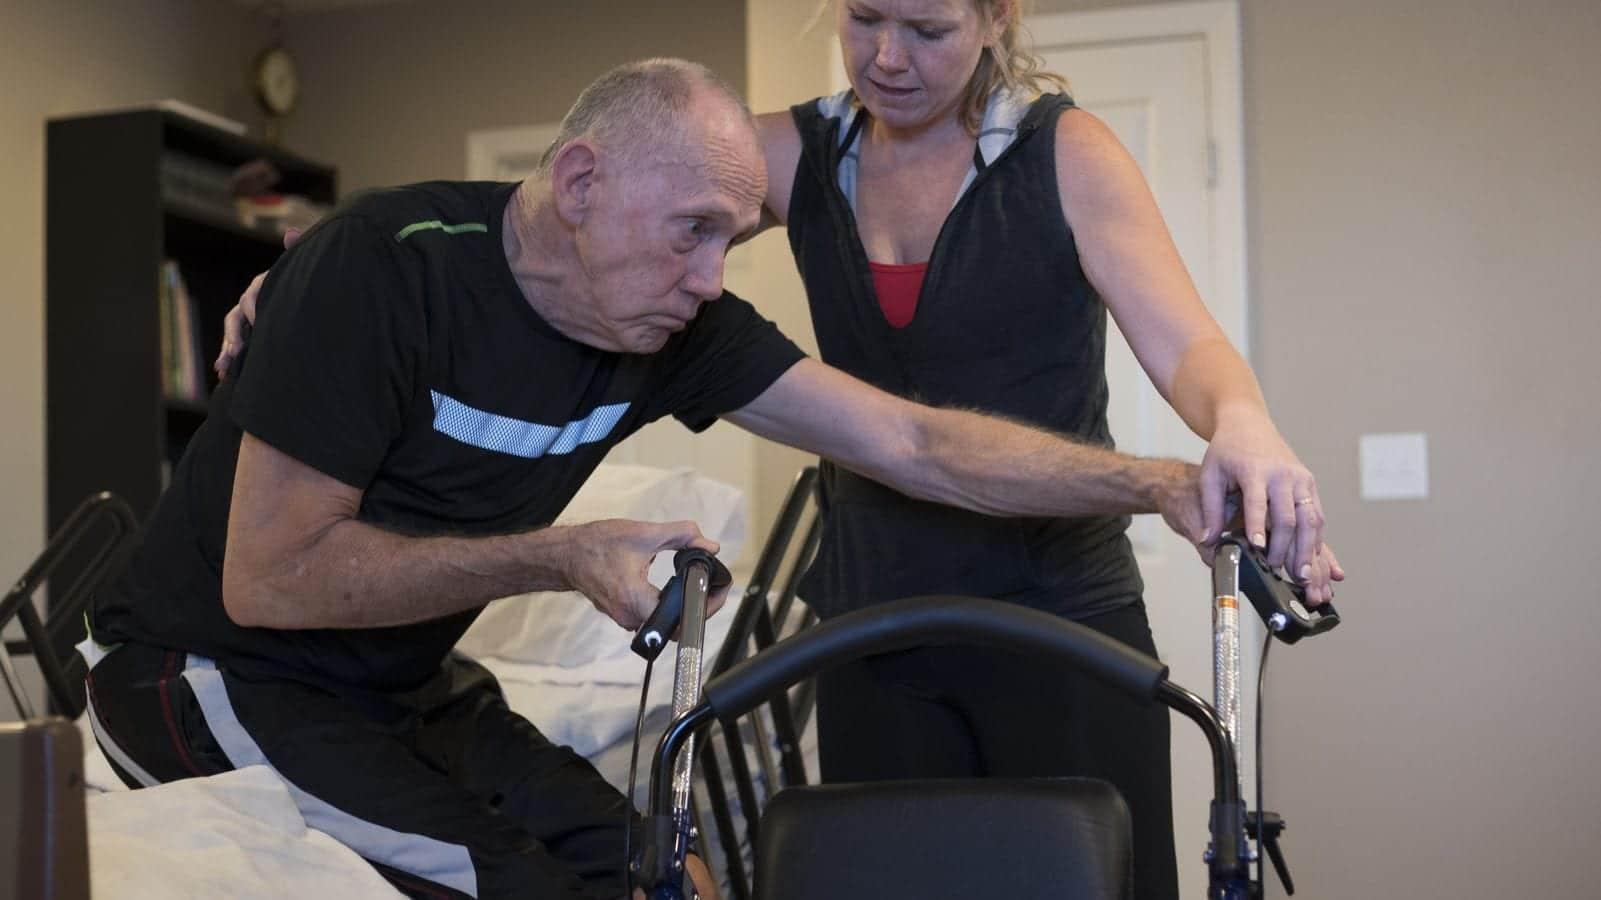 Parkinson's Disease - Walker Stock Photo